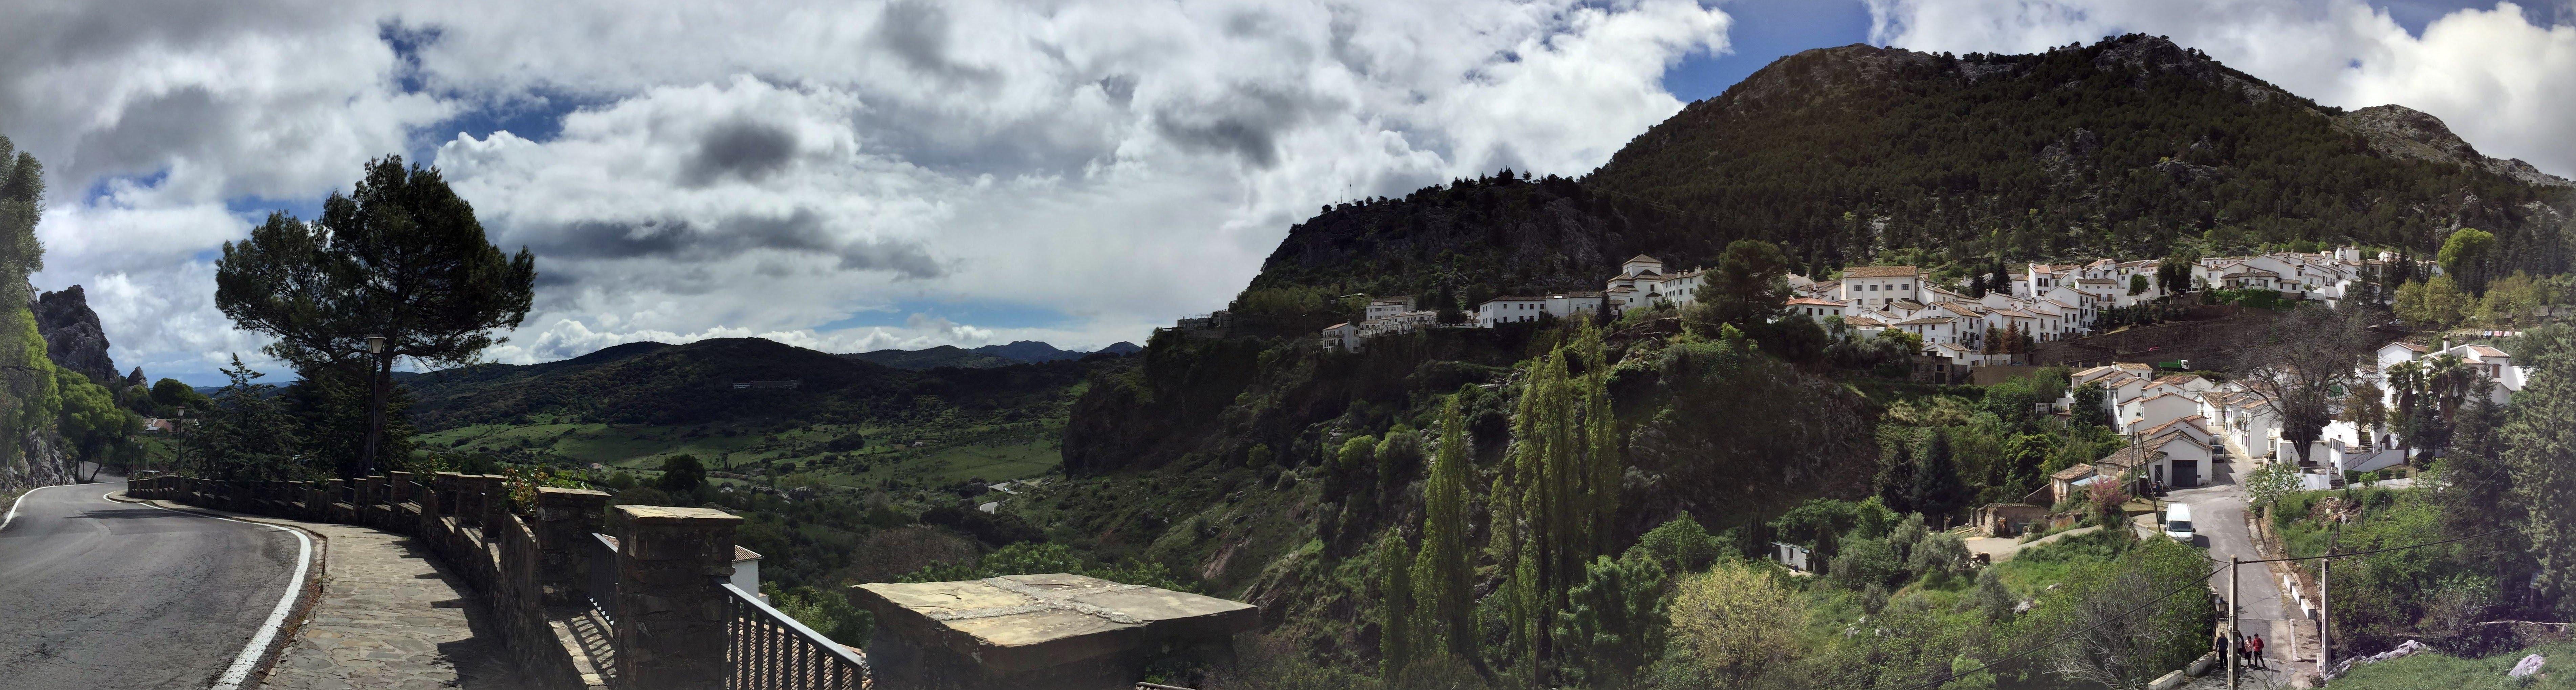 Panorama de Grazalema